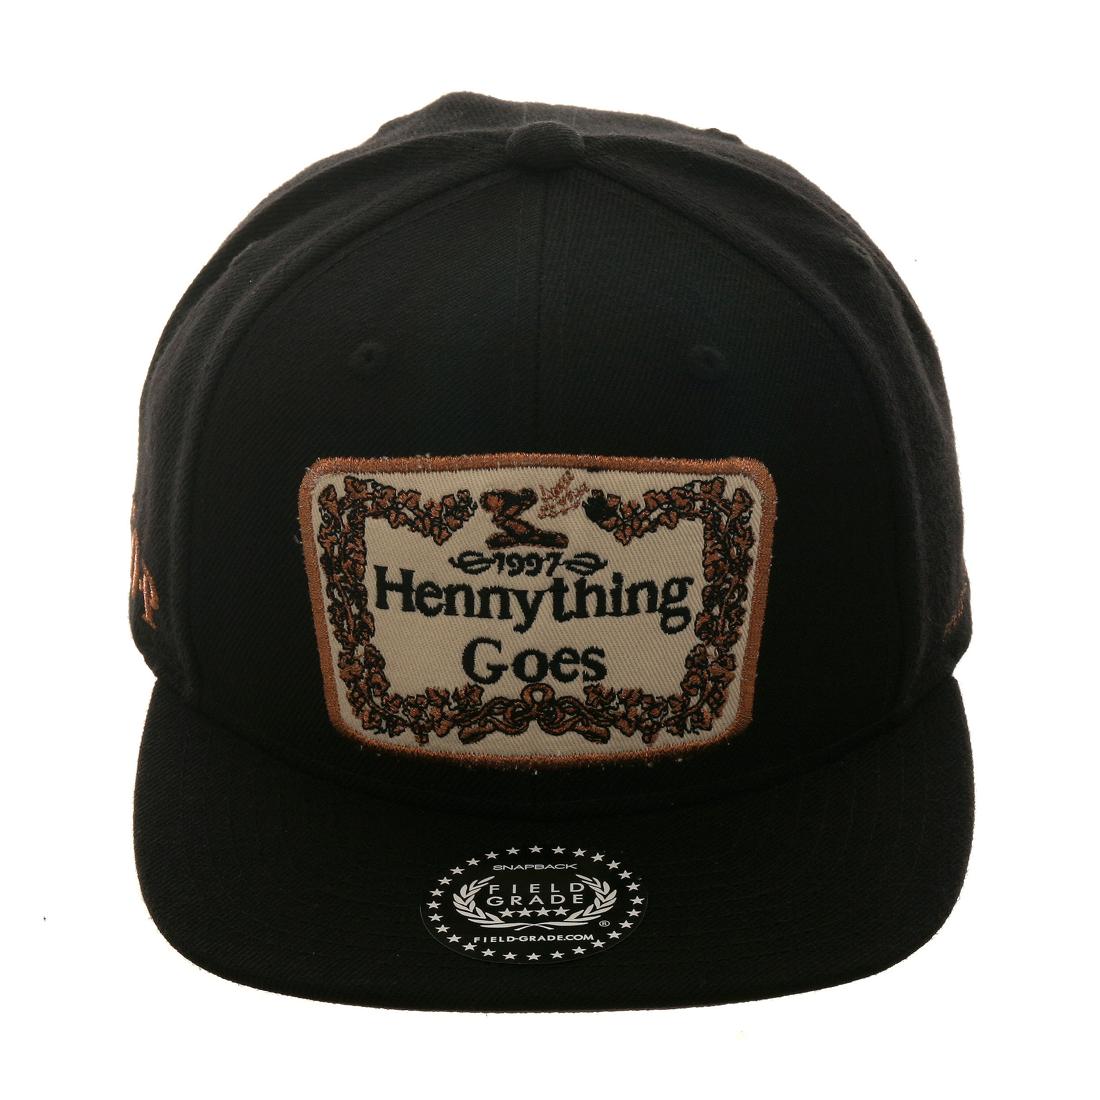 Field Grade Hennything Goes Snapback Hat 8d0889077f89